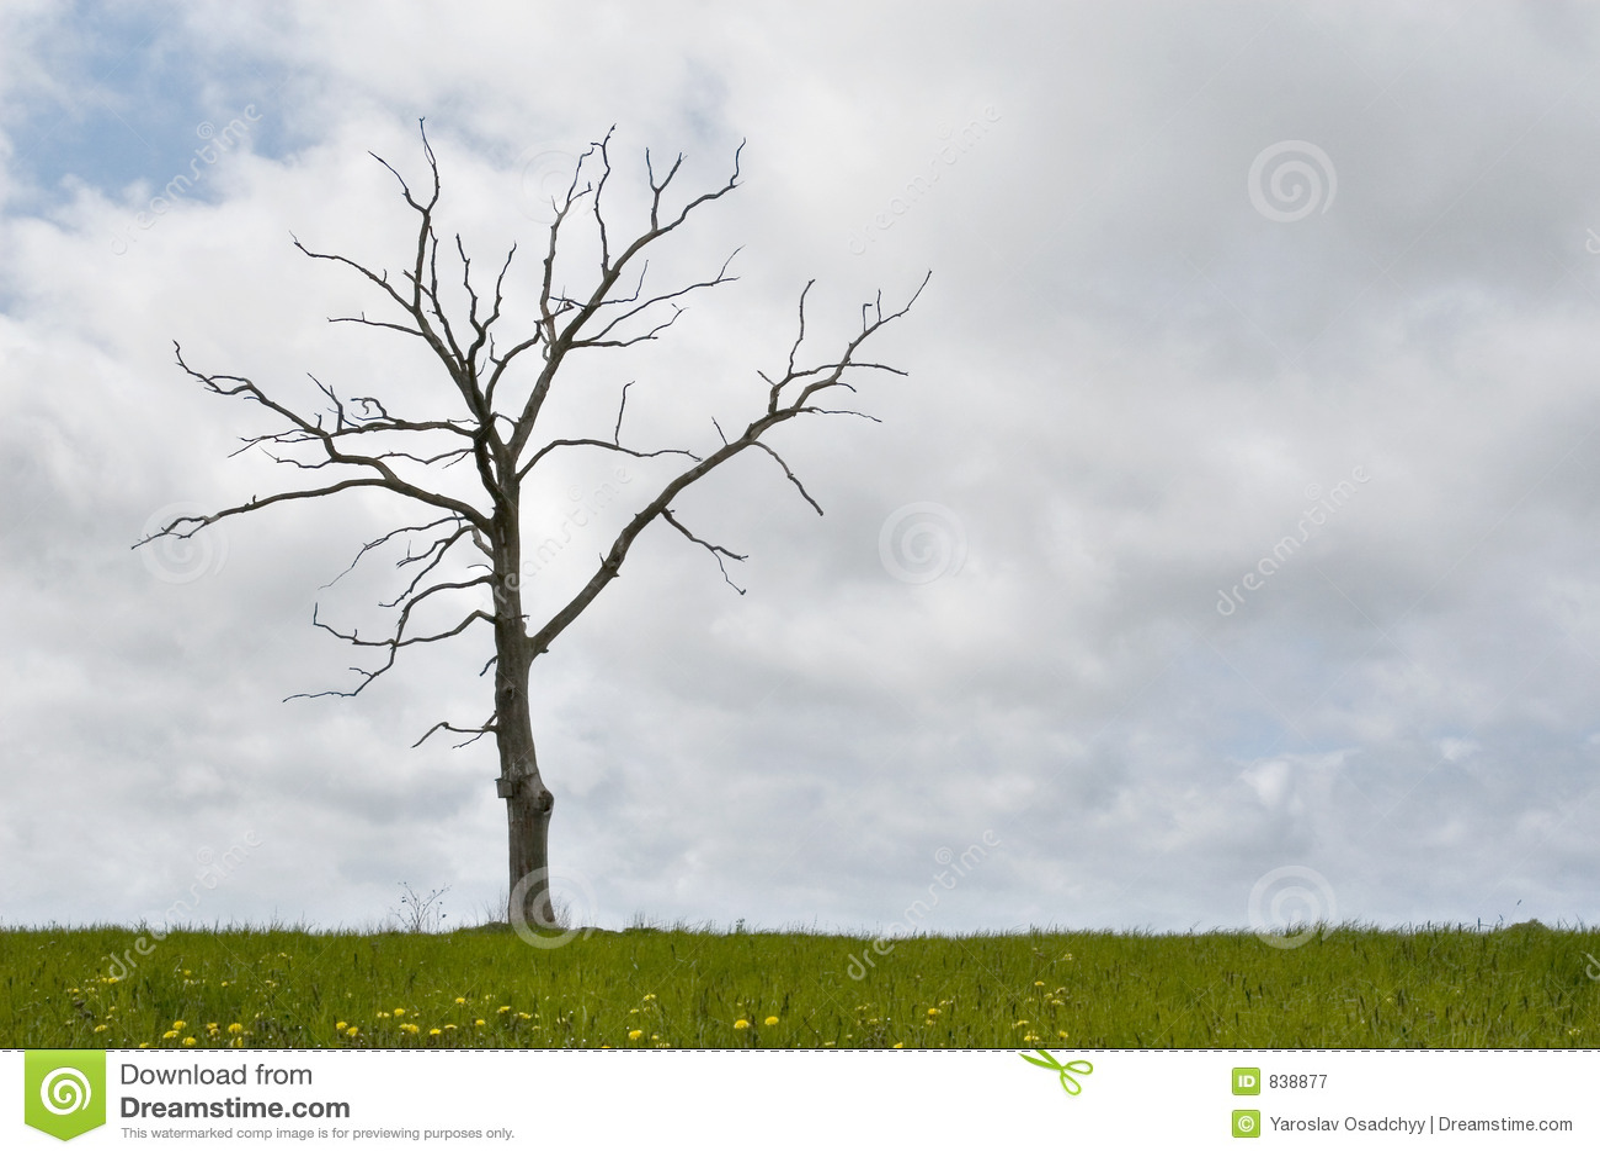 Single dry tree, cloudy sky, grass at bottom